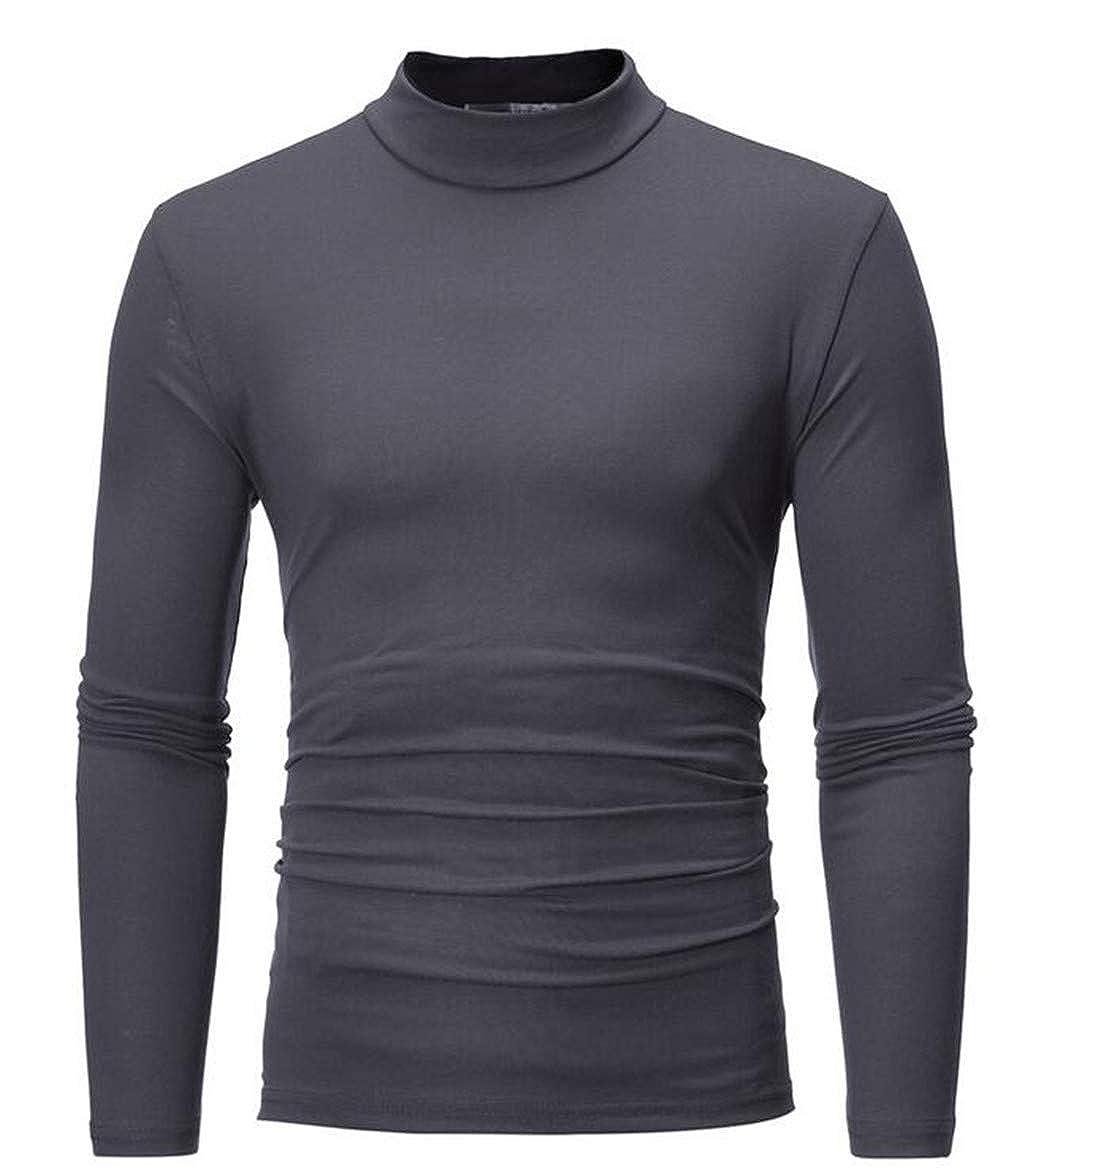 GRMO Men Autumn Mock Thermal Turtleneck Long Sleeve Basic Solid T Shirt